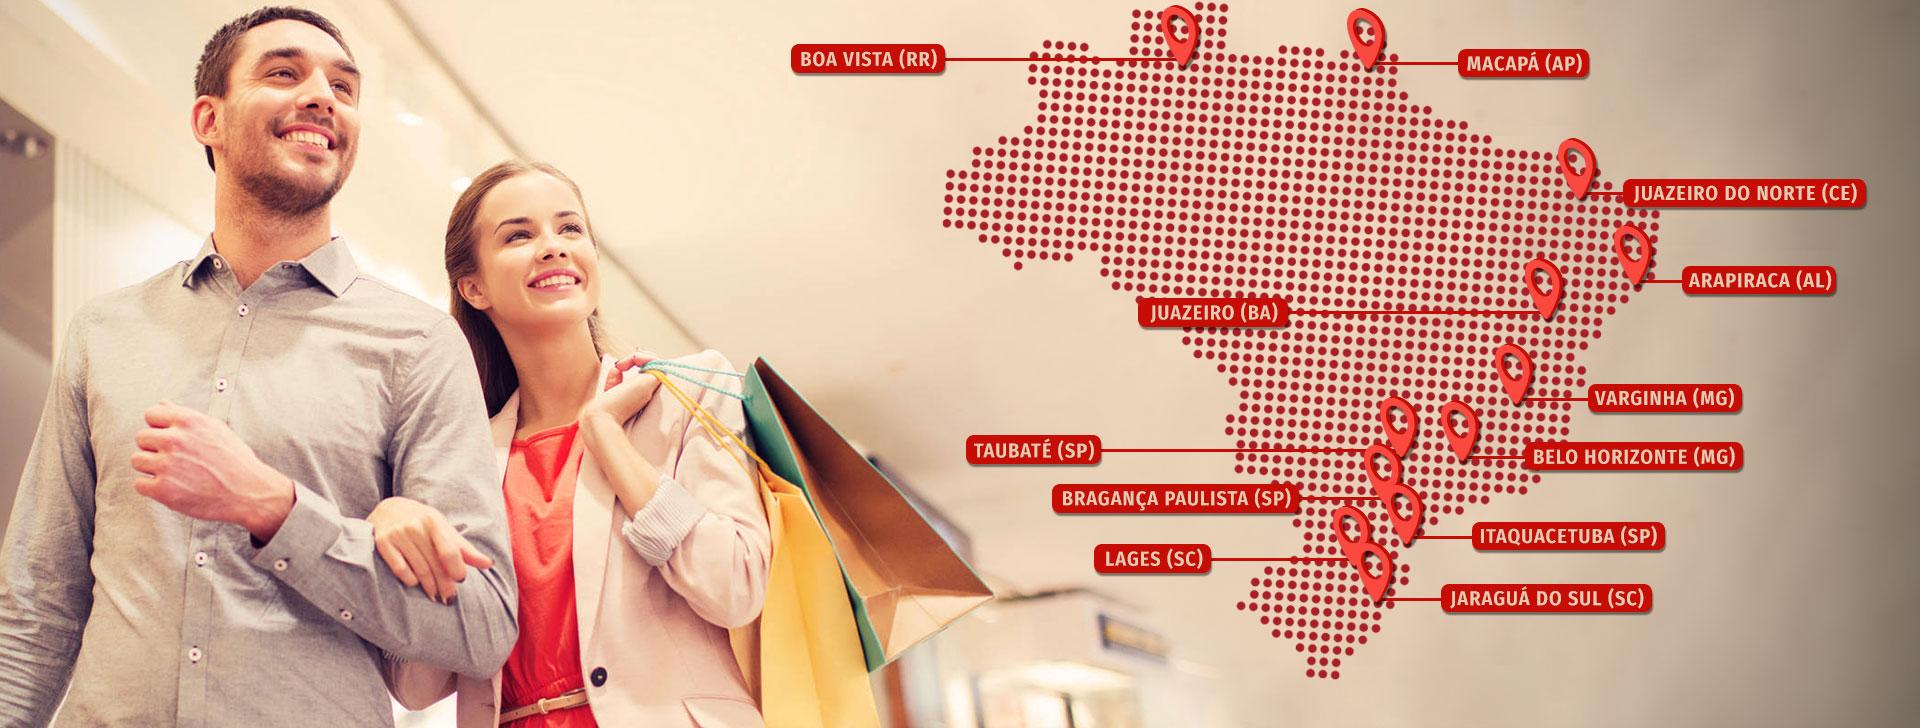 HOME - GRUPO TENCO - Mapa - Empreendimentos